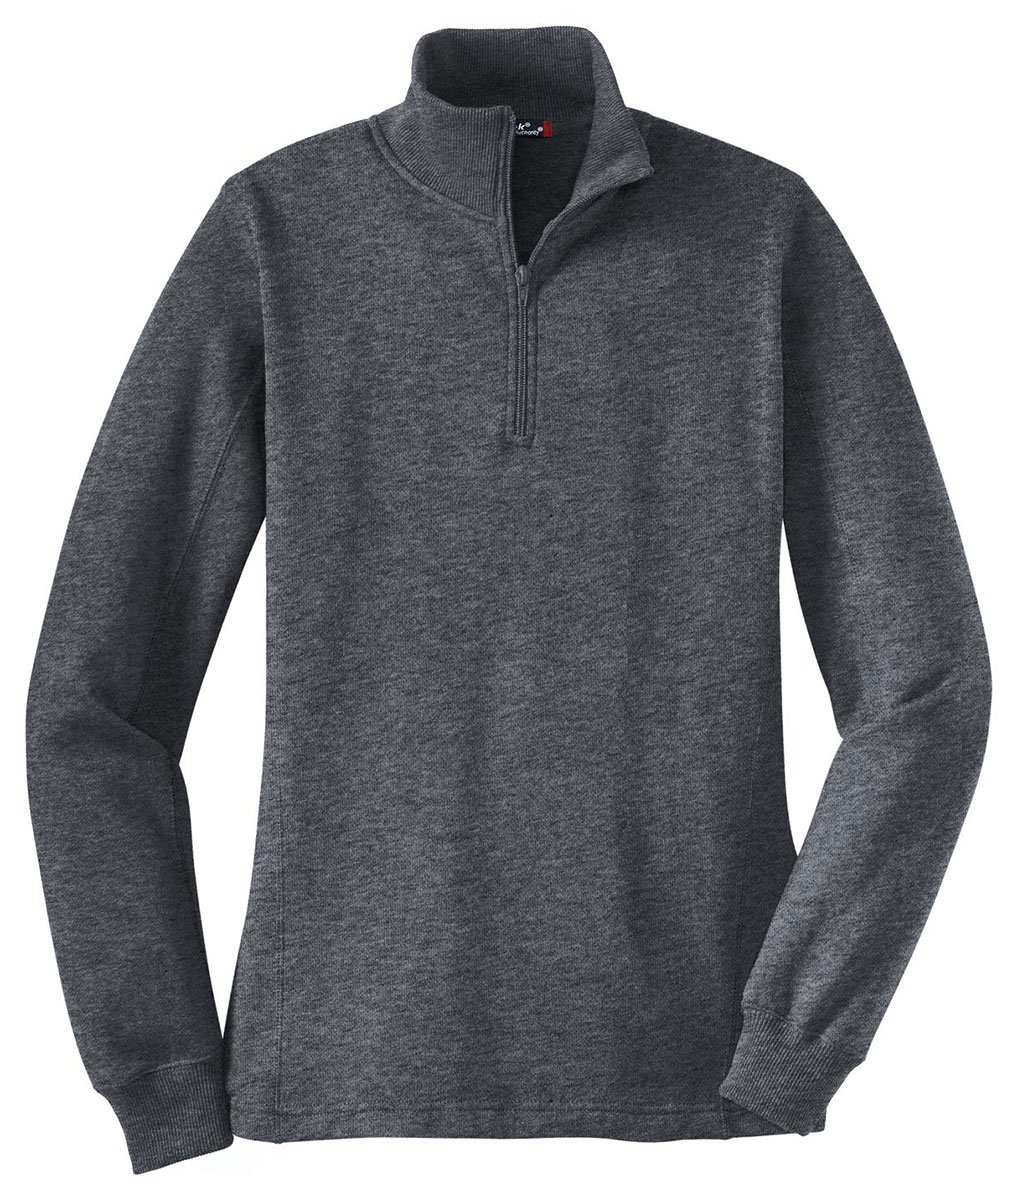 Sport-Tek Ladies 1/4-Zip Sweatshirt - XX-Large - Graphite Heather